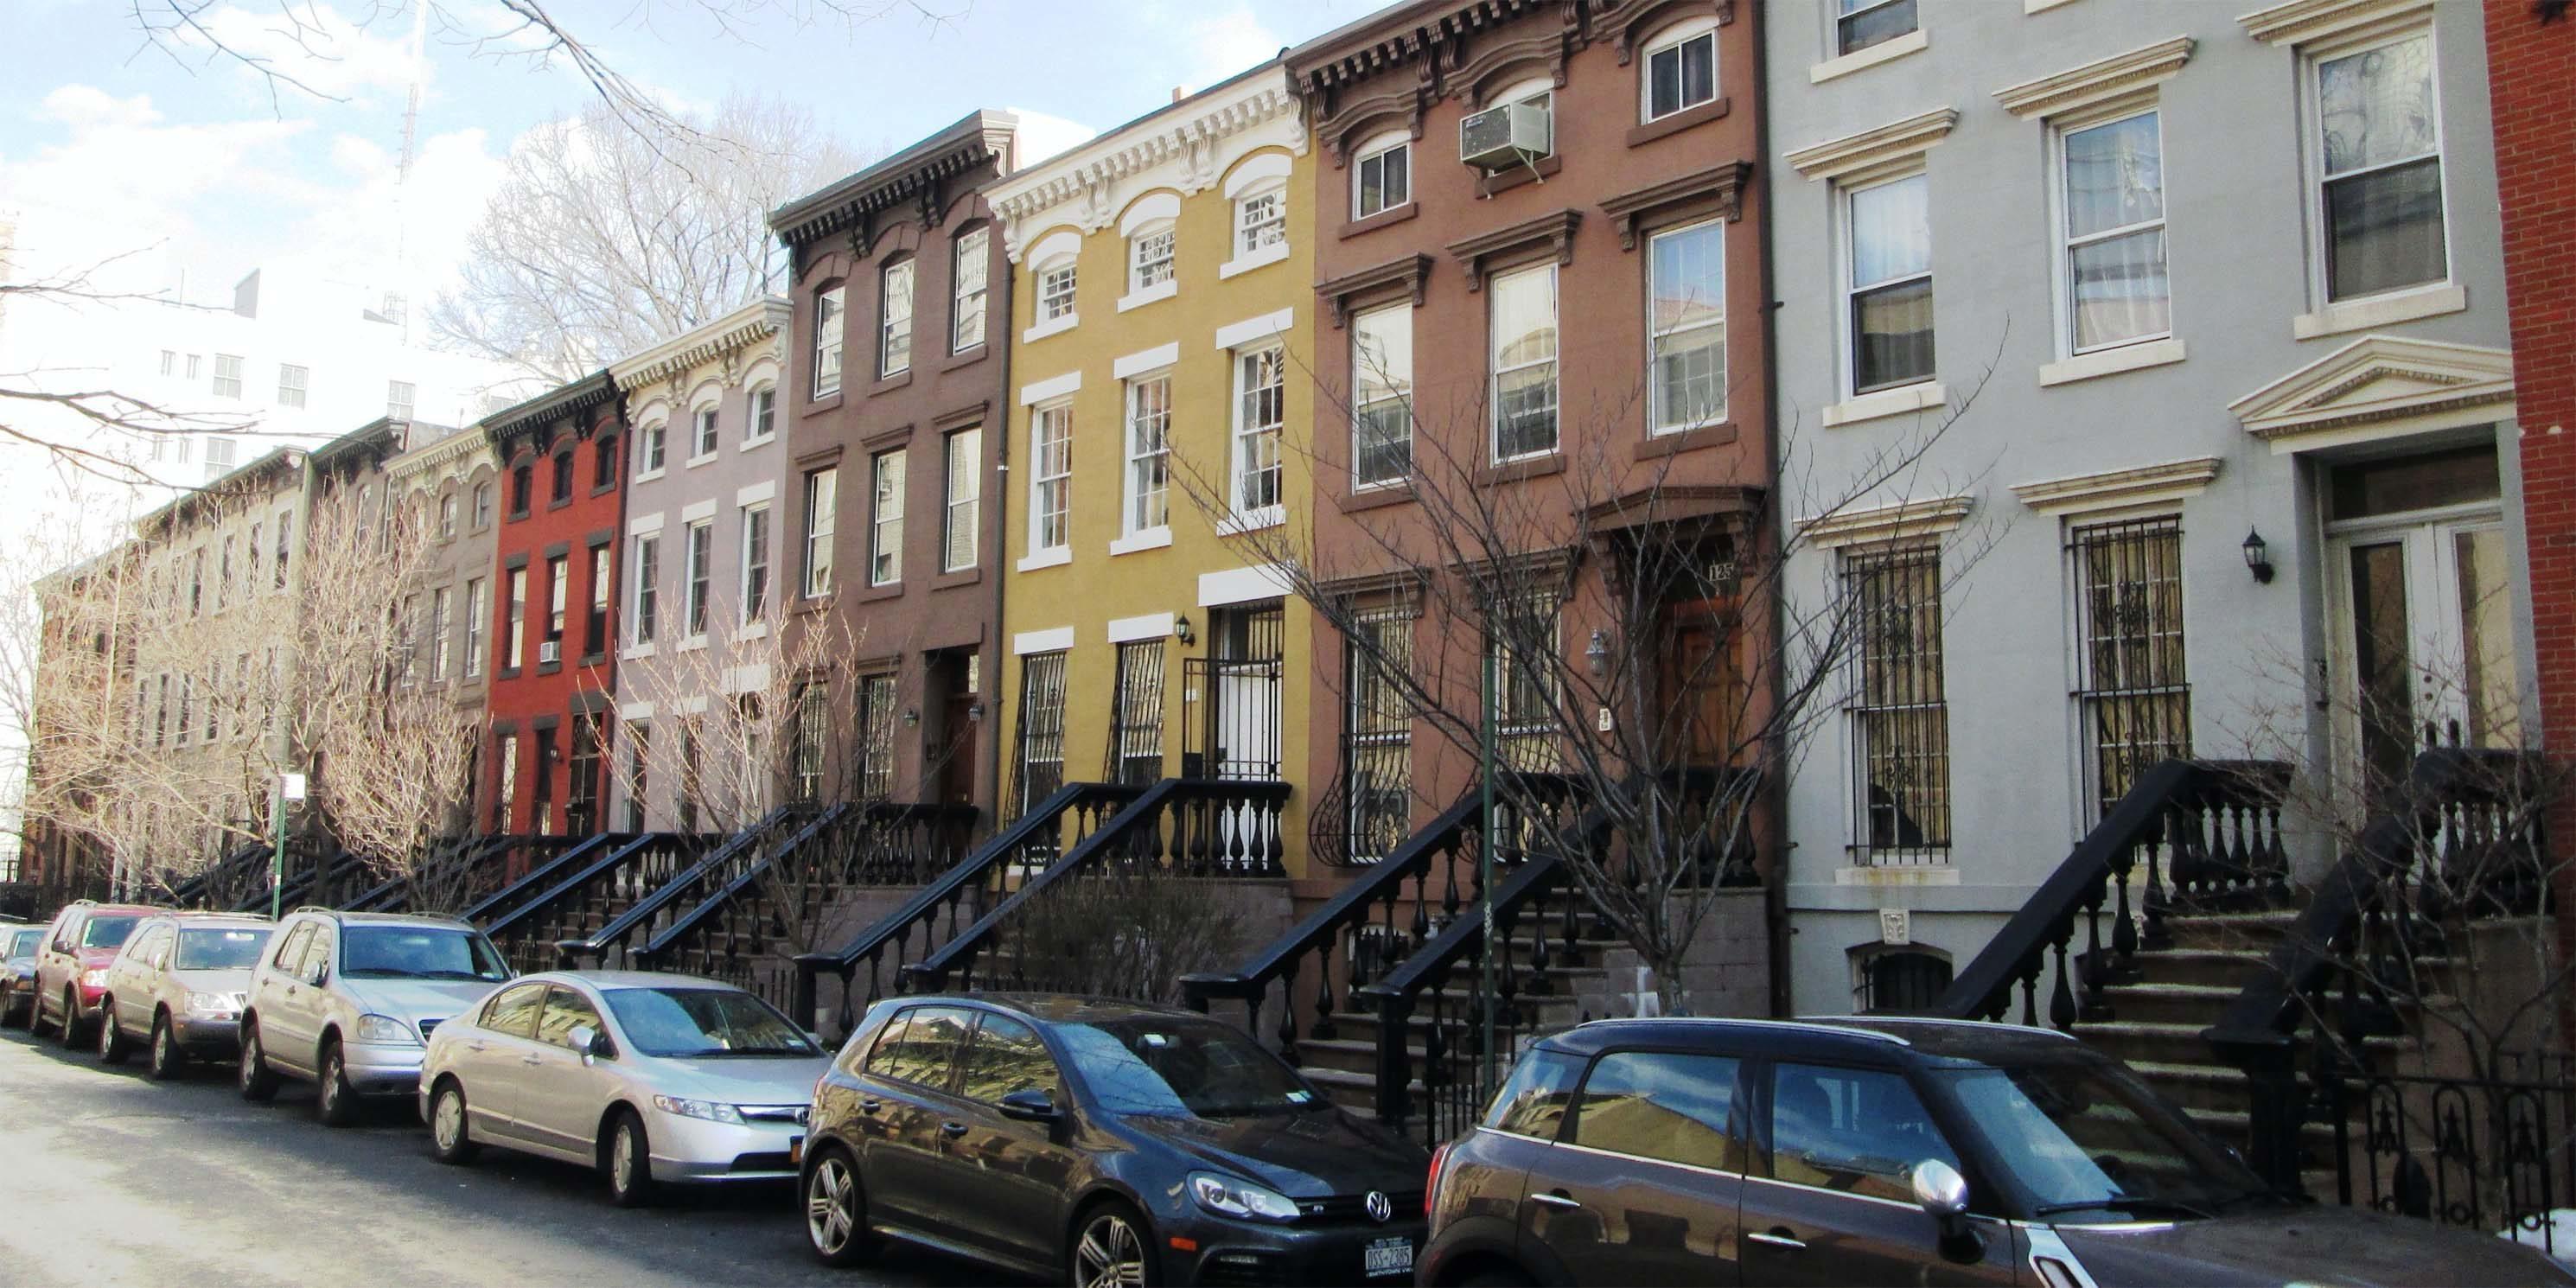 rowhouses on St. Felix Street in Brooklyn